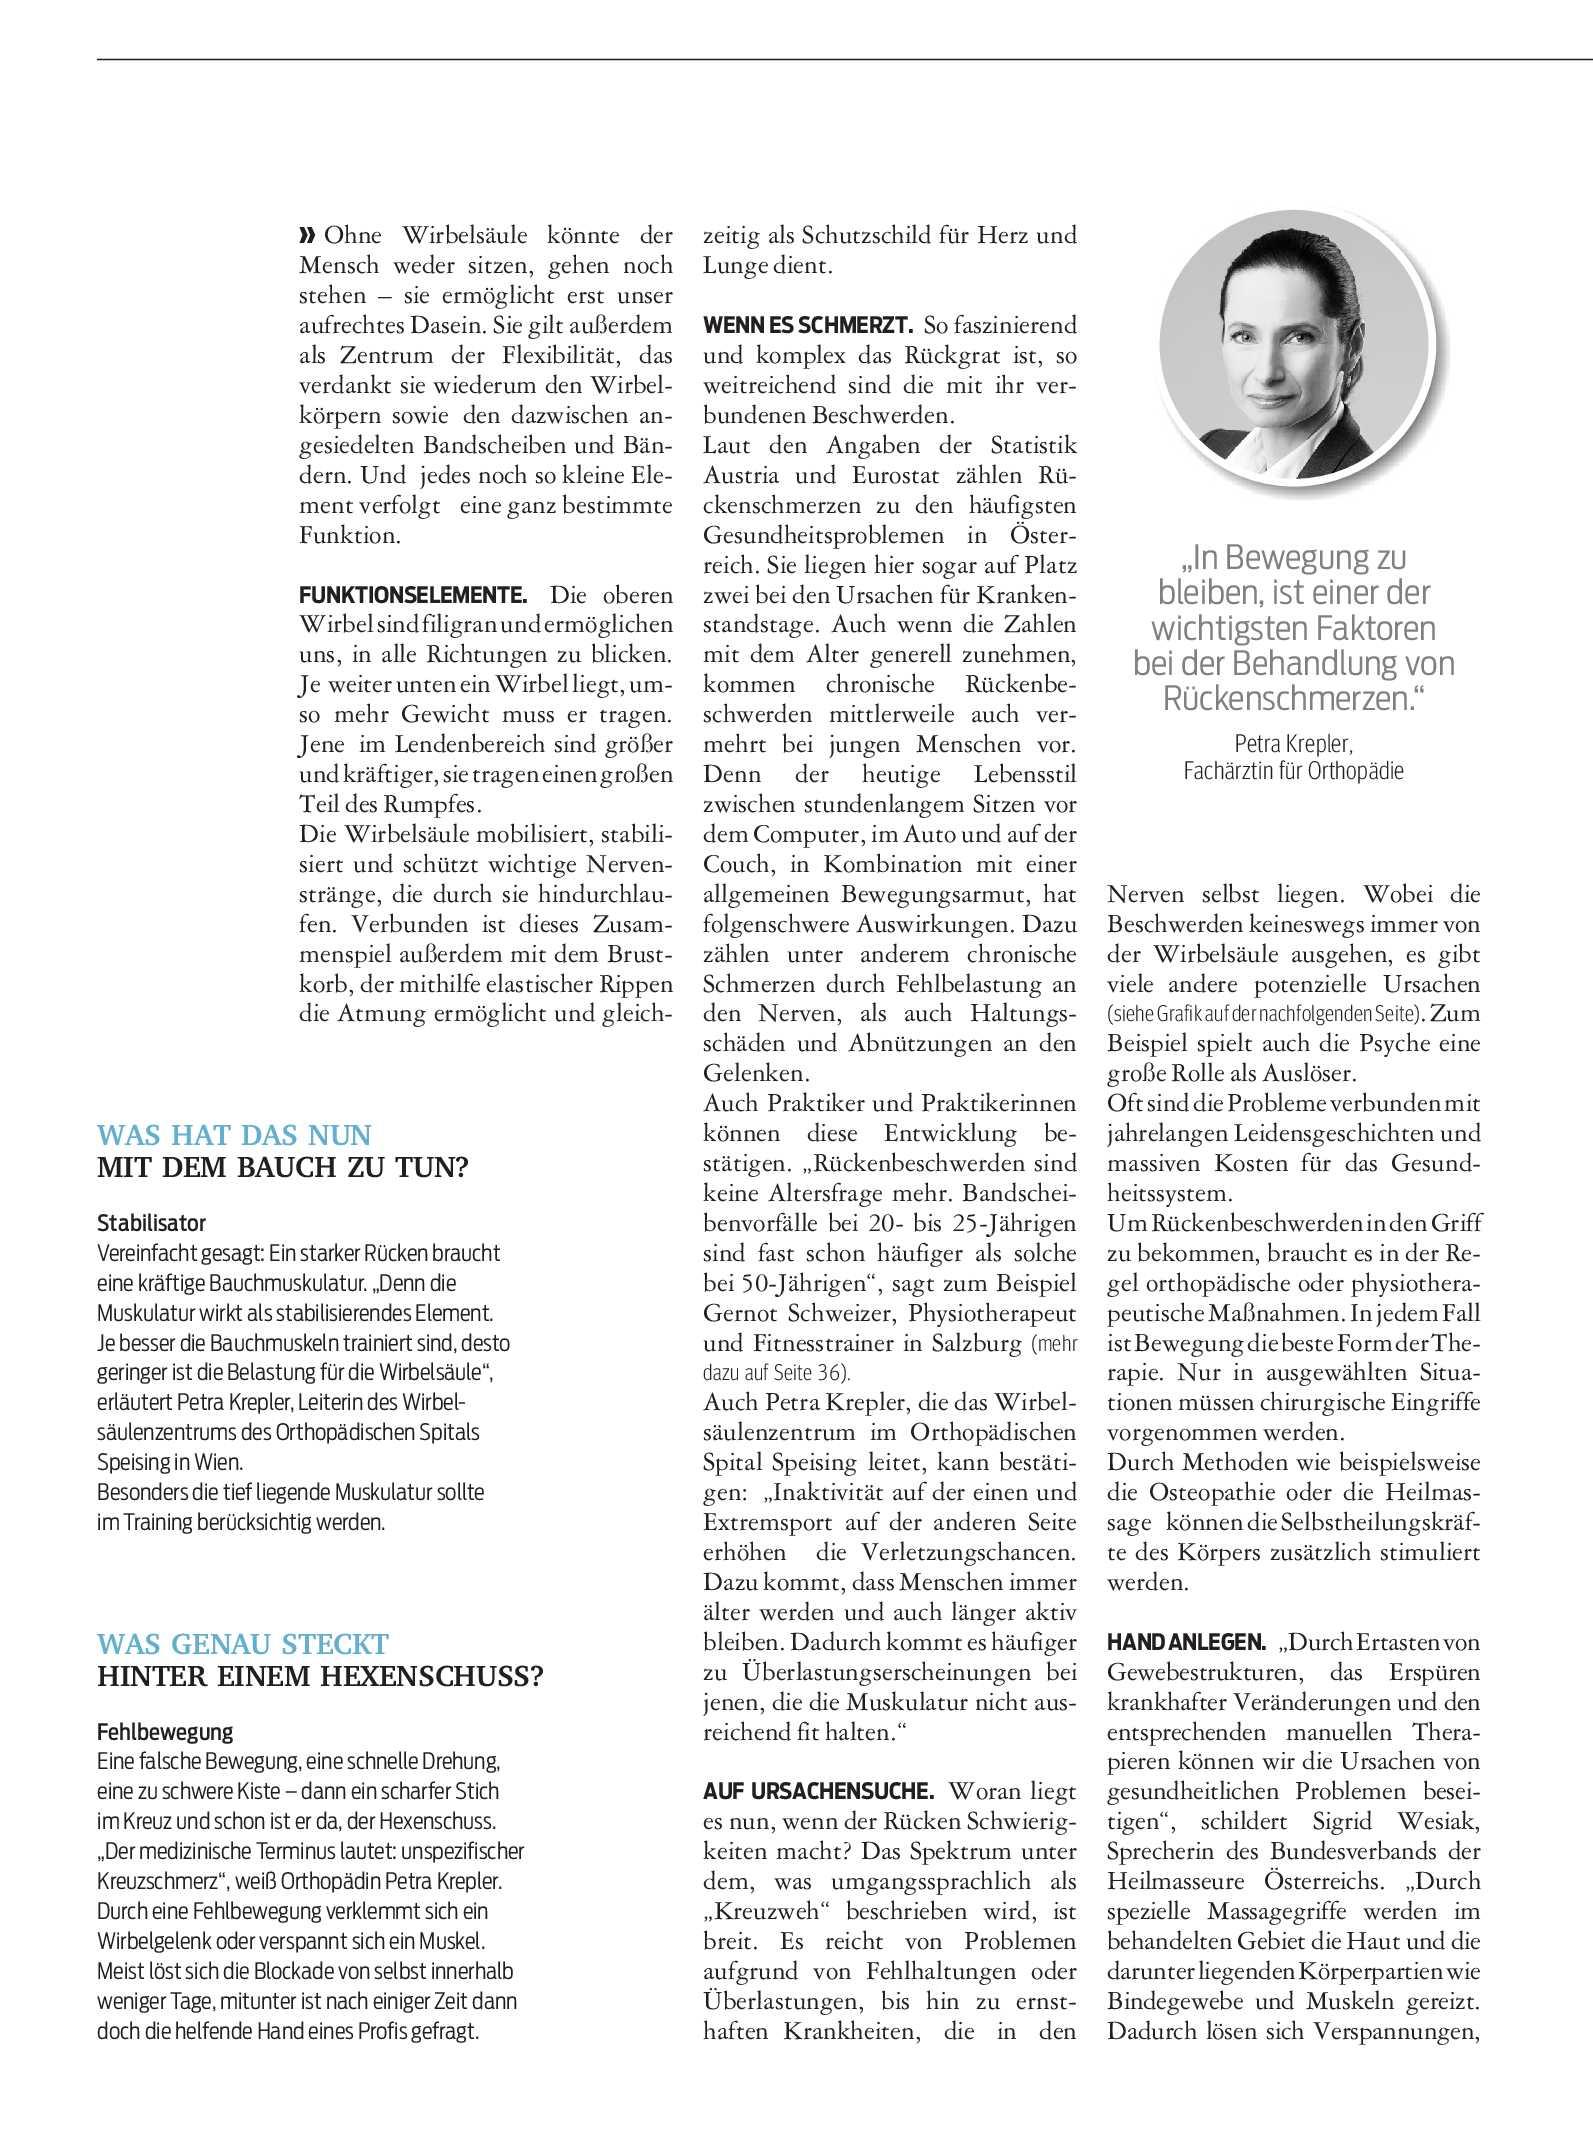 public/epaper/imported/20201125/kurier/magazin/magazin_20201125_032.jpg